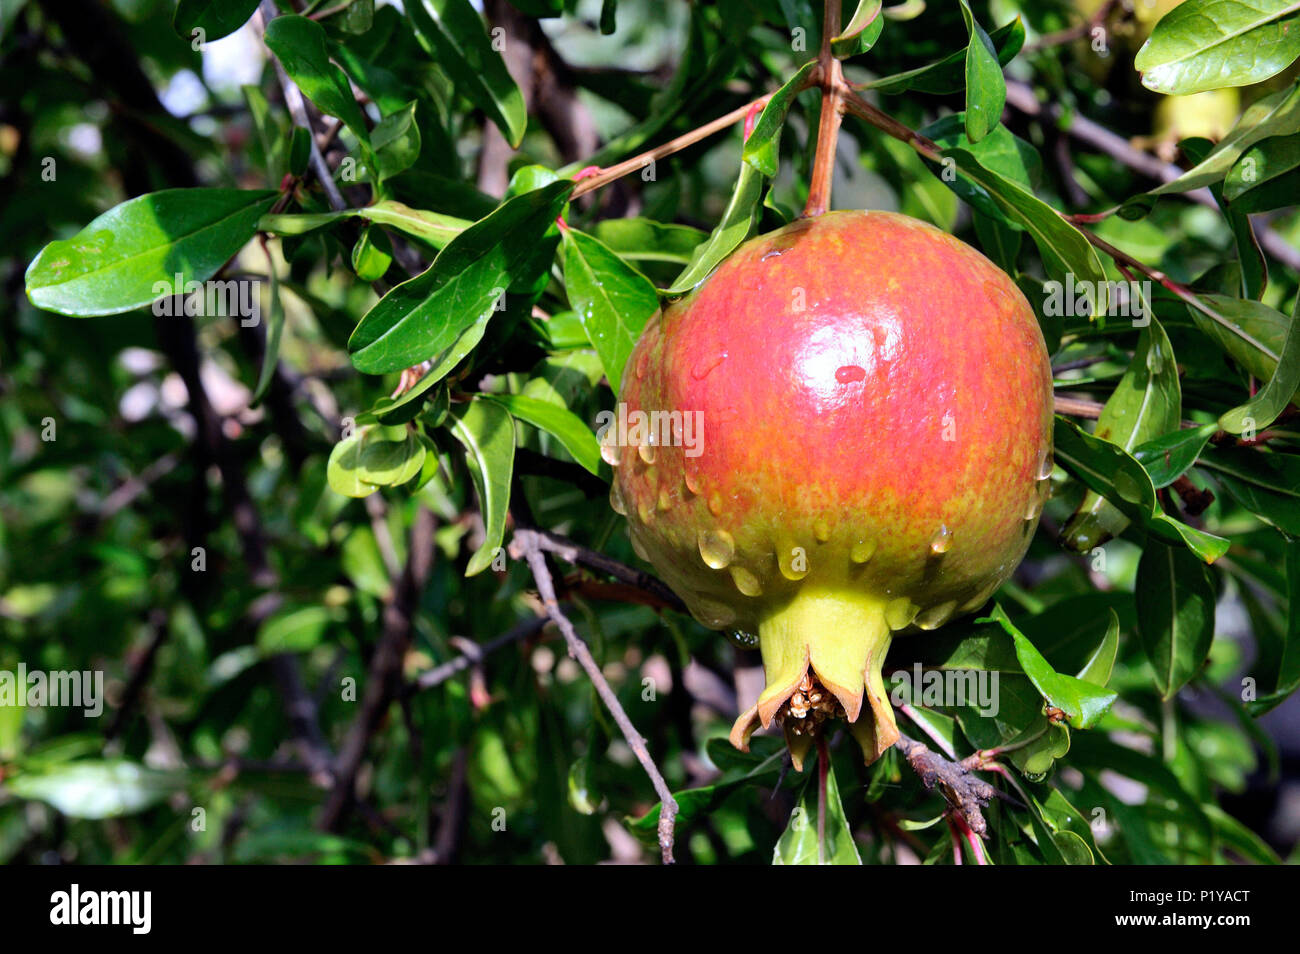 spain granada fruit of pomegranate stock photo 207739976 alamy